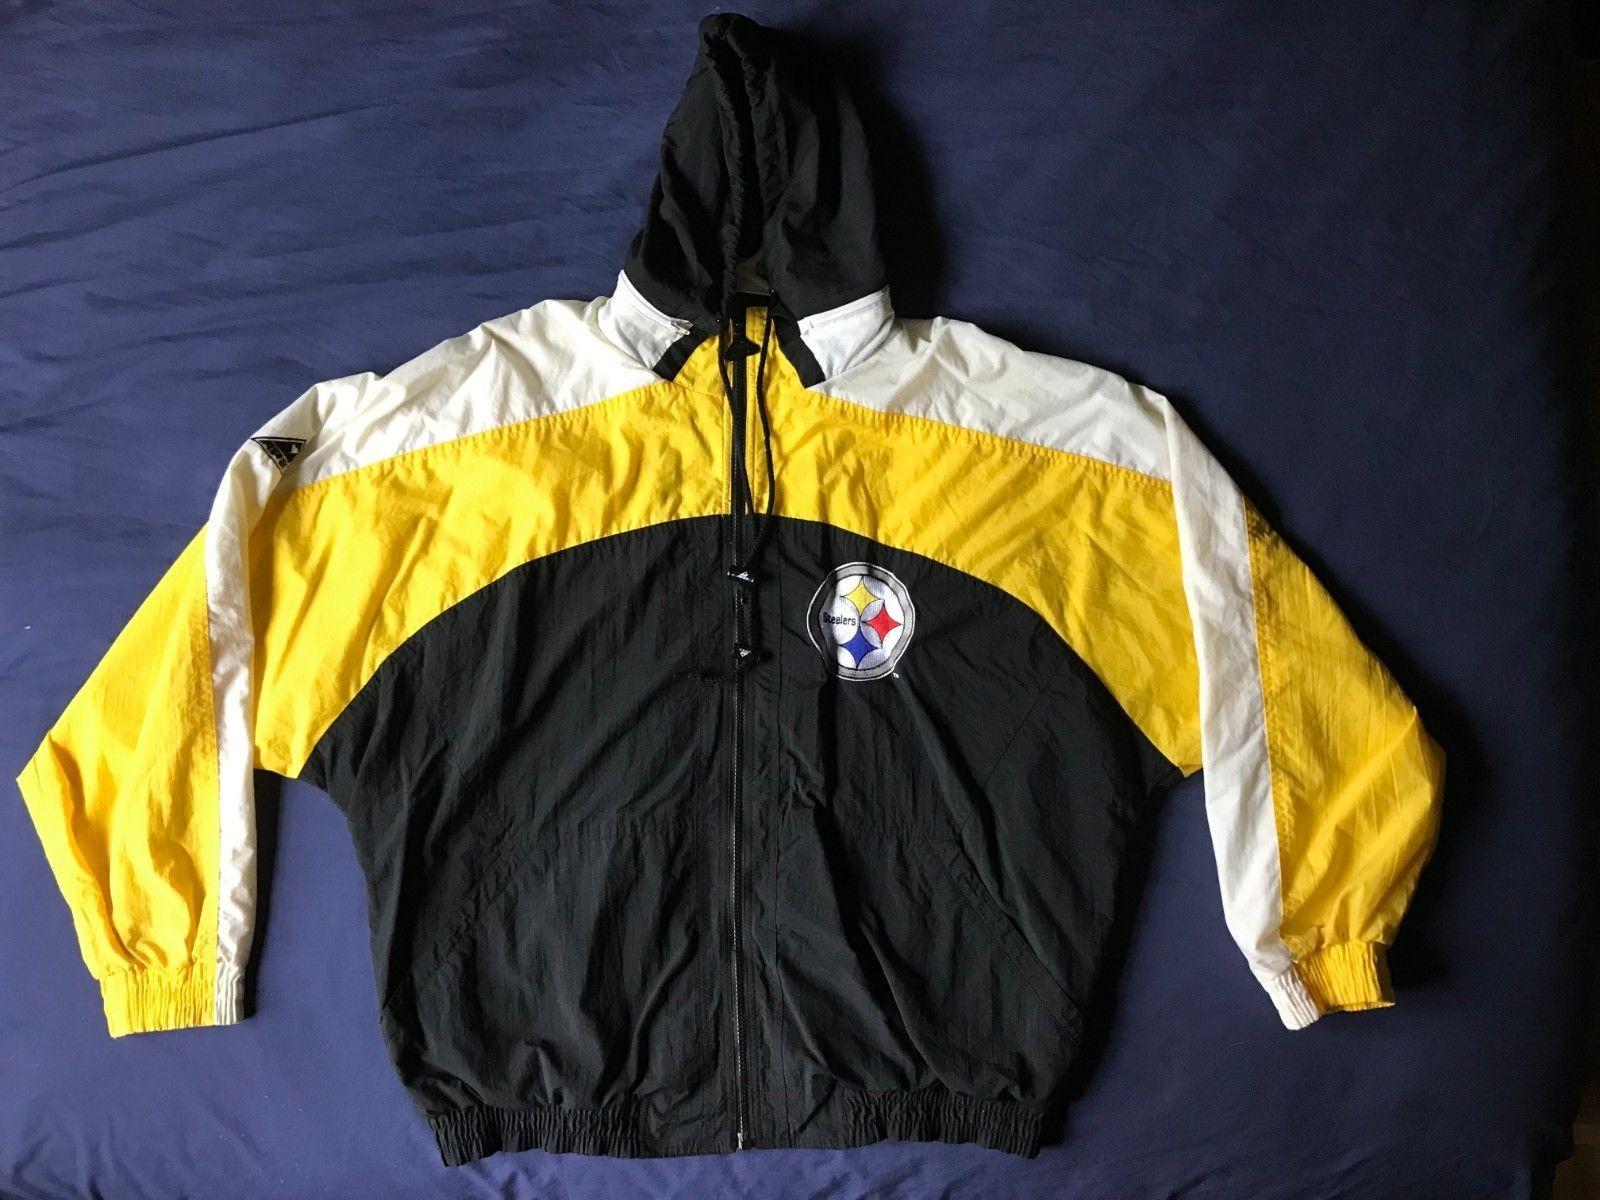 timeless design 58fa3 02816 Men's vintage 90's Starter MLB Pittsburgh Steelers ...